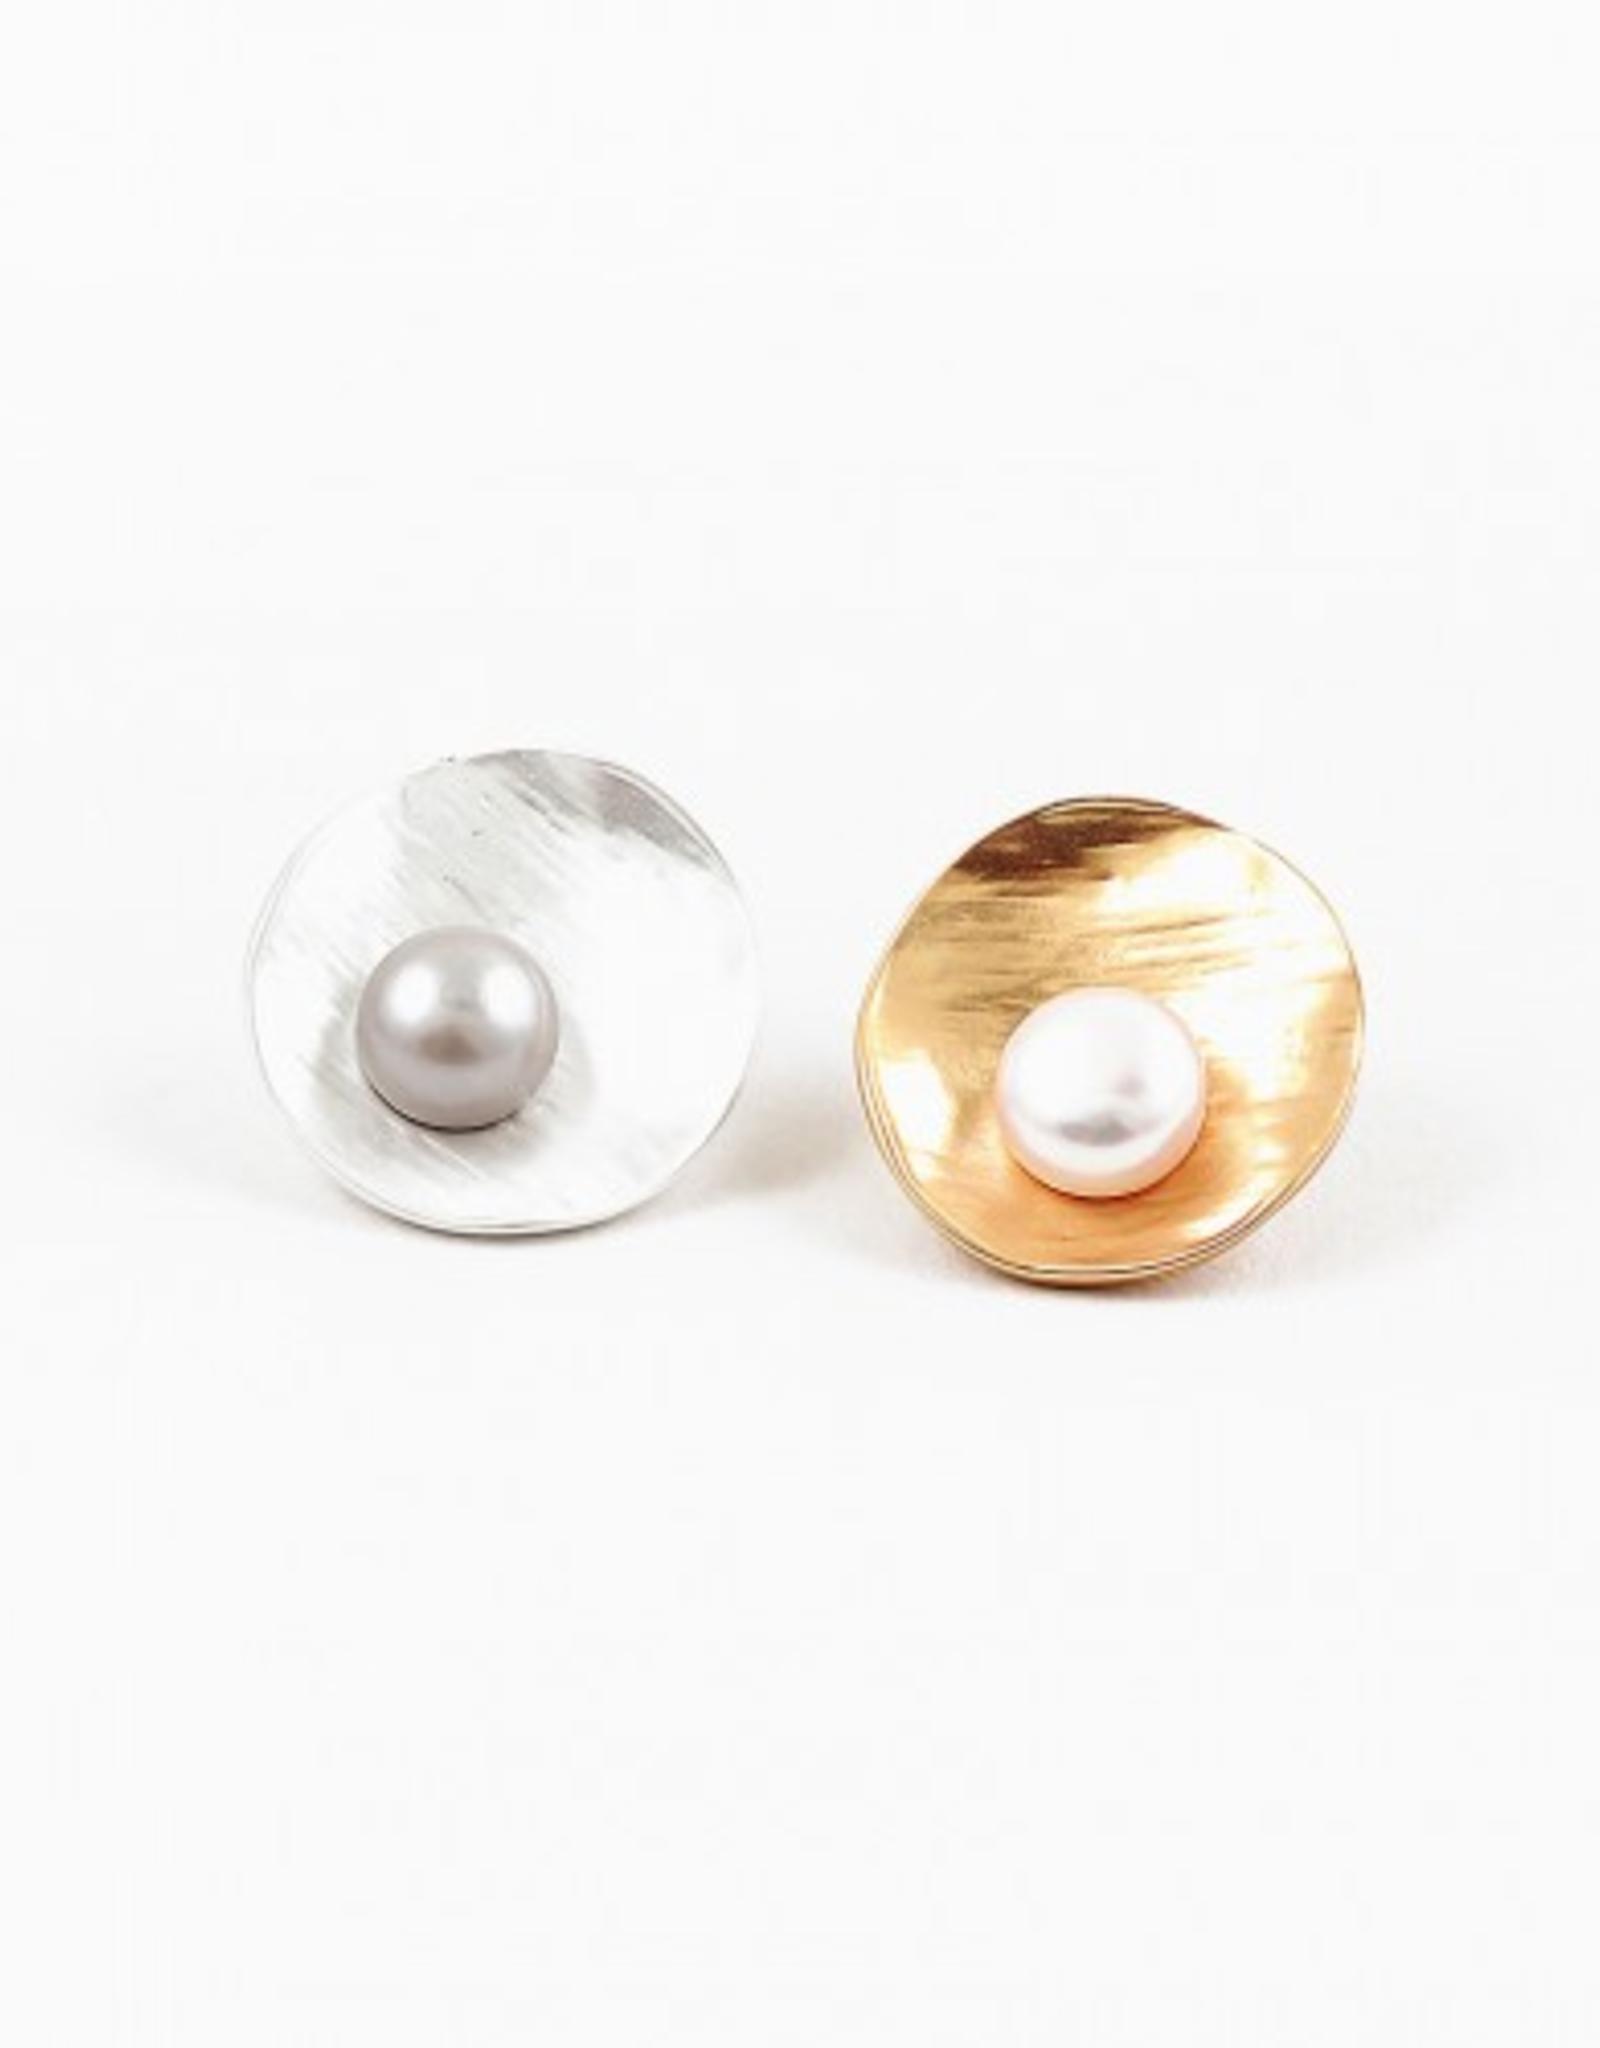 Blue Suede Jewels Pearl & Matte Metal Stud Earring